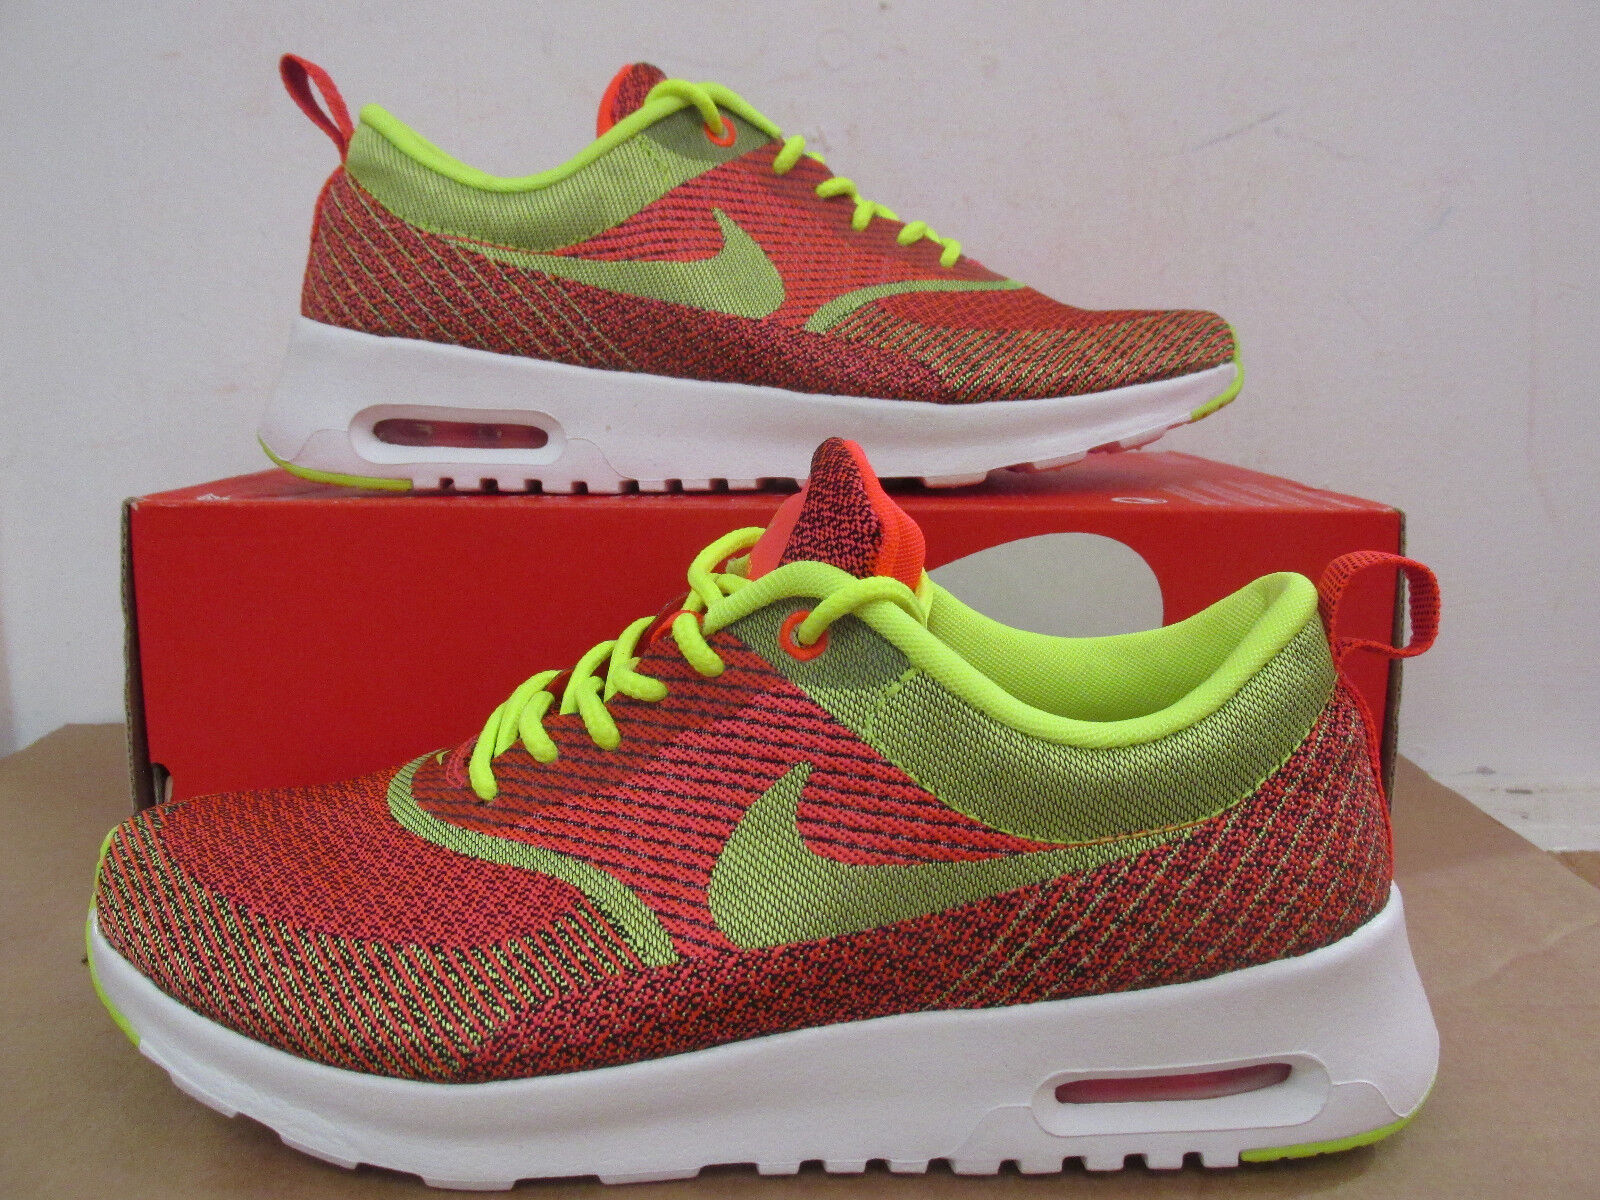 Para mujer Nike Air Max Thea JCRD Qs Zapatillas Correr Entrenadores 666545 607 Zapatillas Qs aclaramiento efdbd0